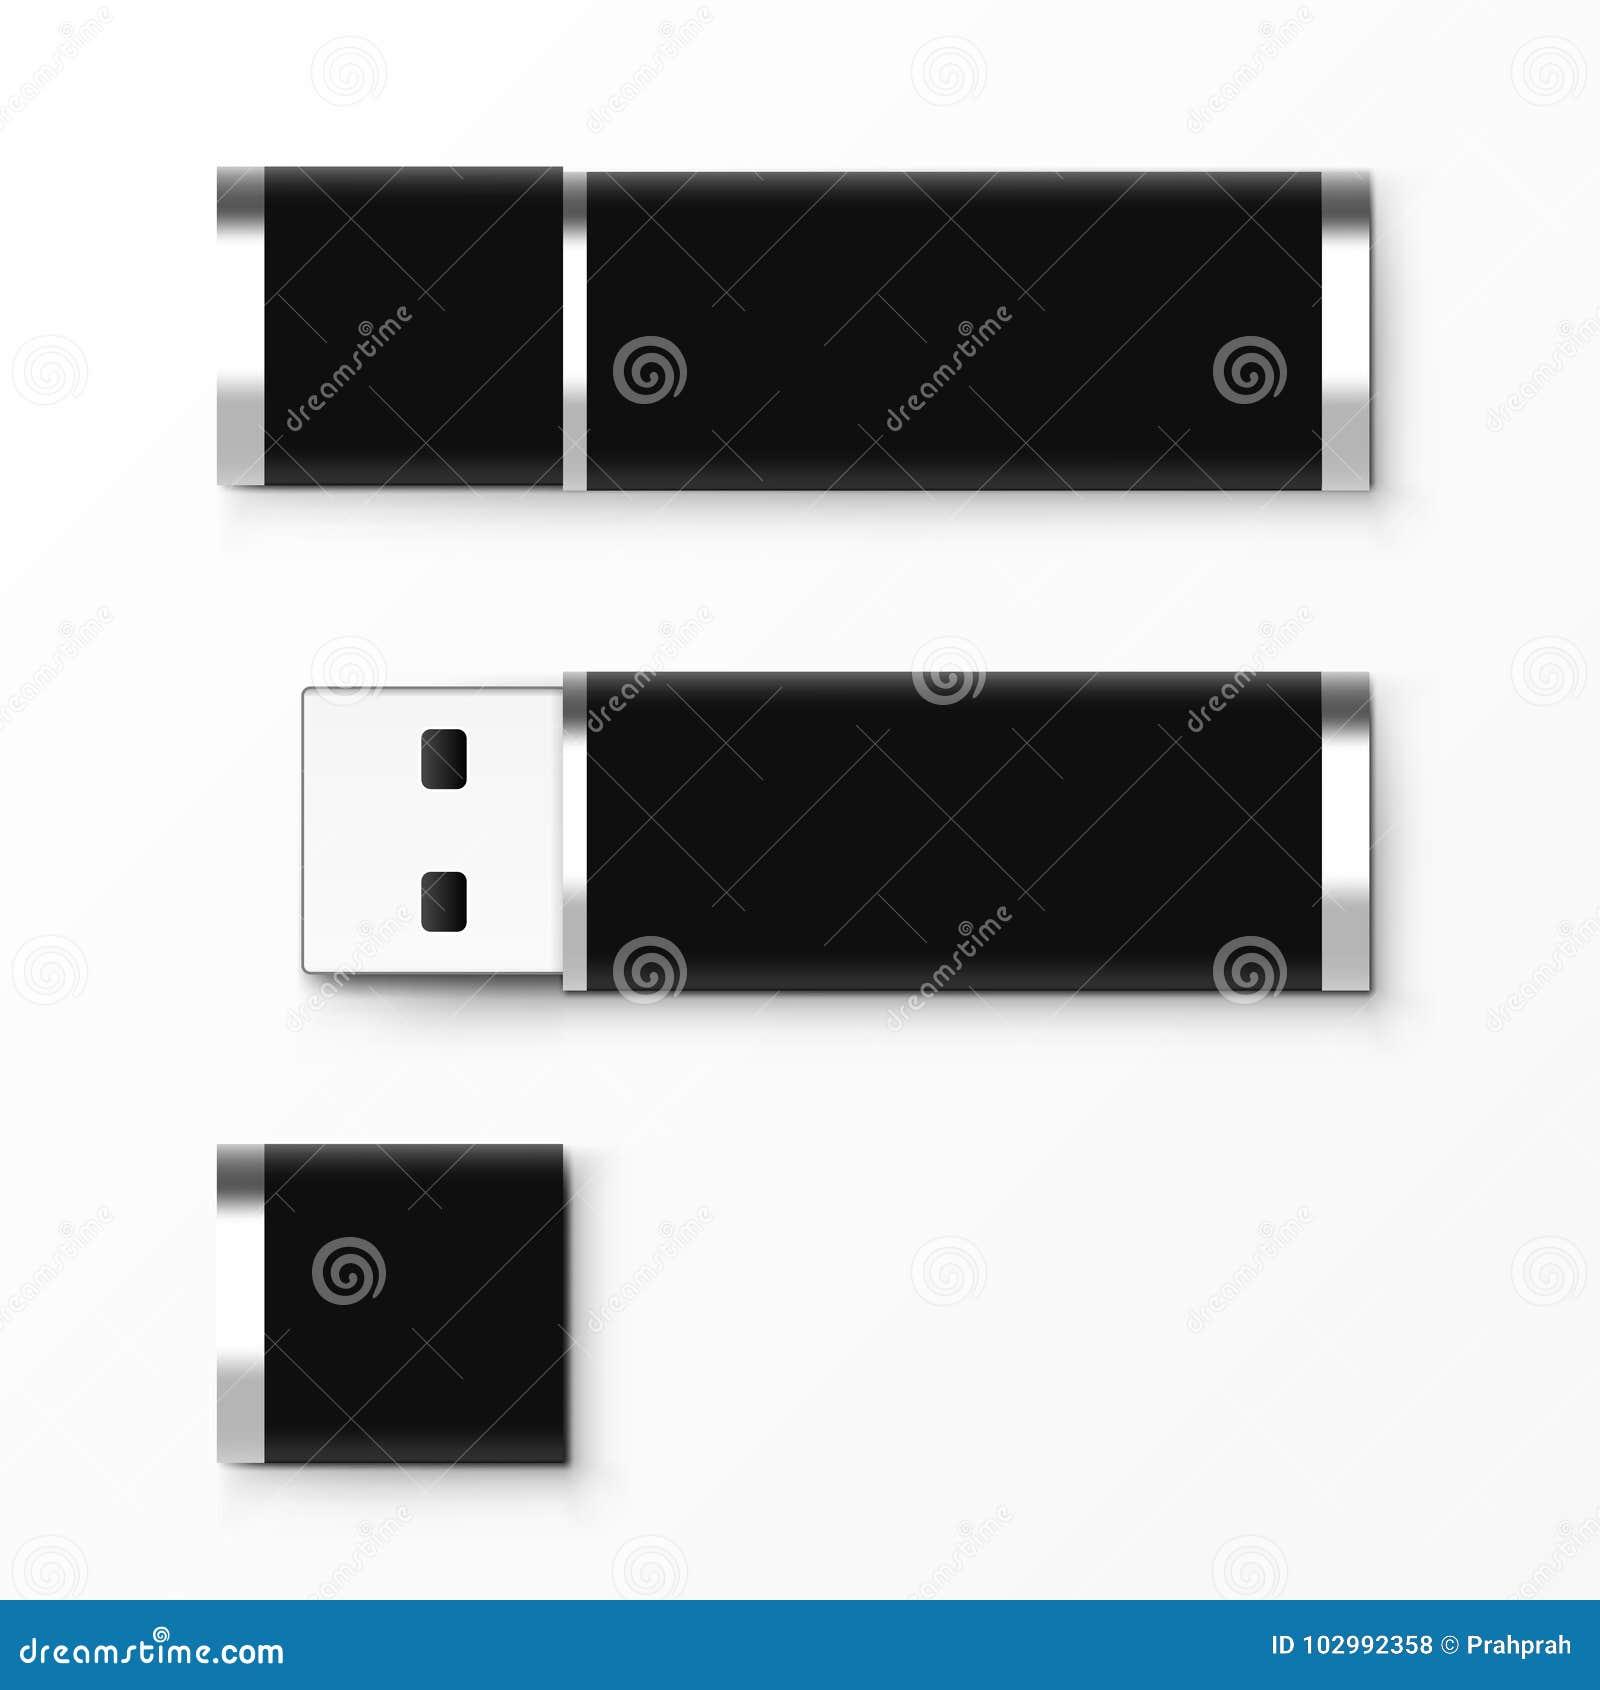 Black Usb Flash Drive Template For Advertising Branding And Corporate Identity Stock Illustration Illustration Of Branding Digital 102992358